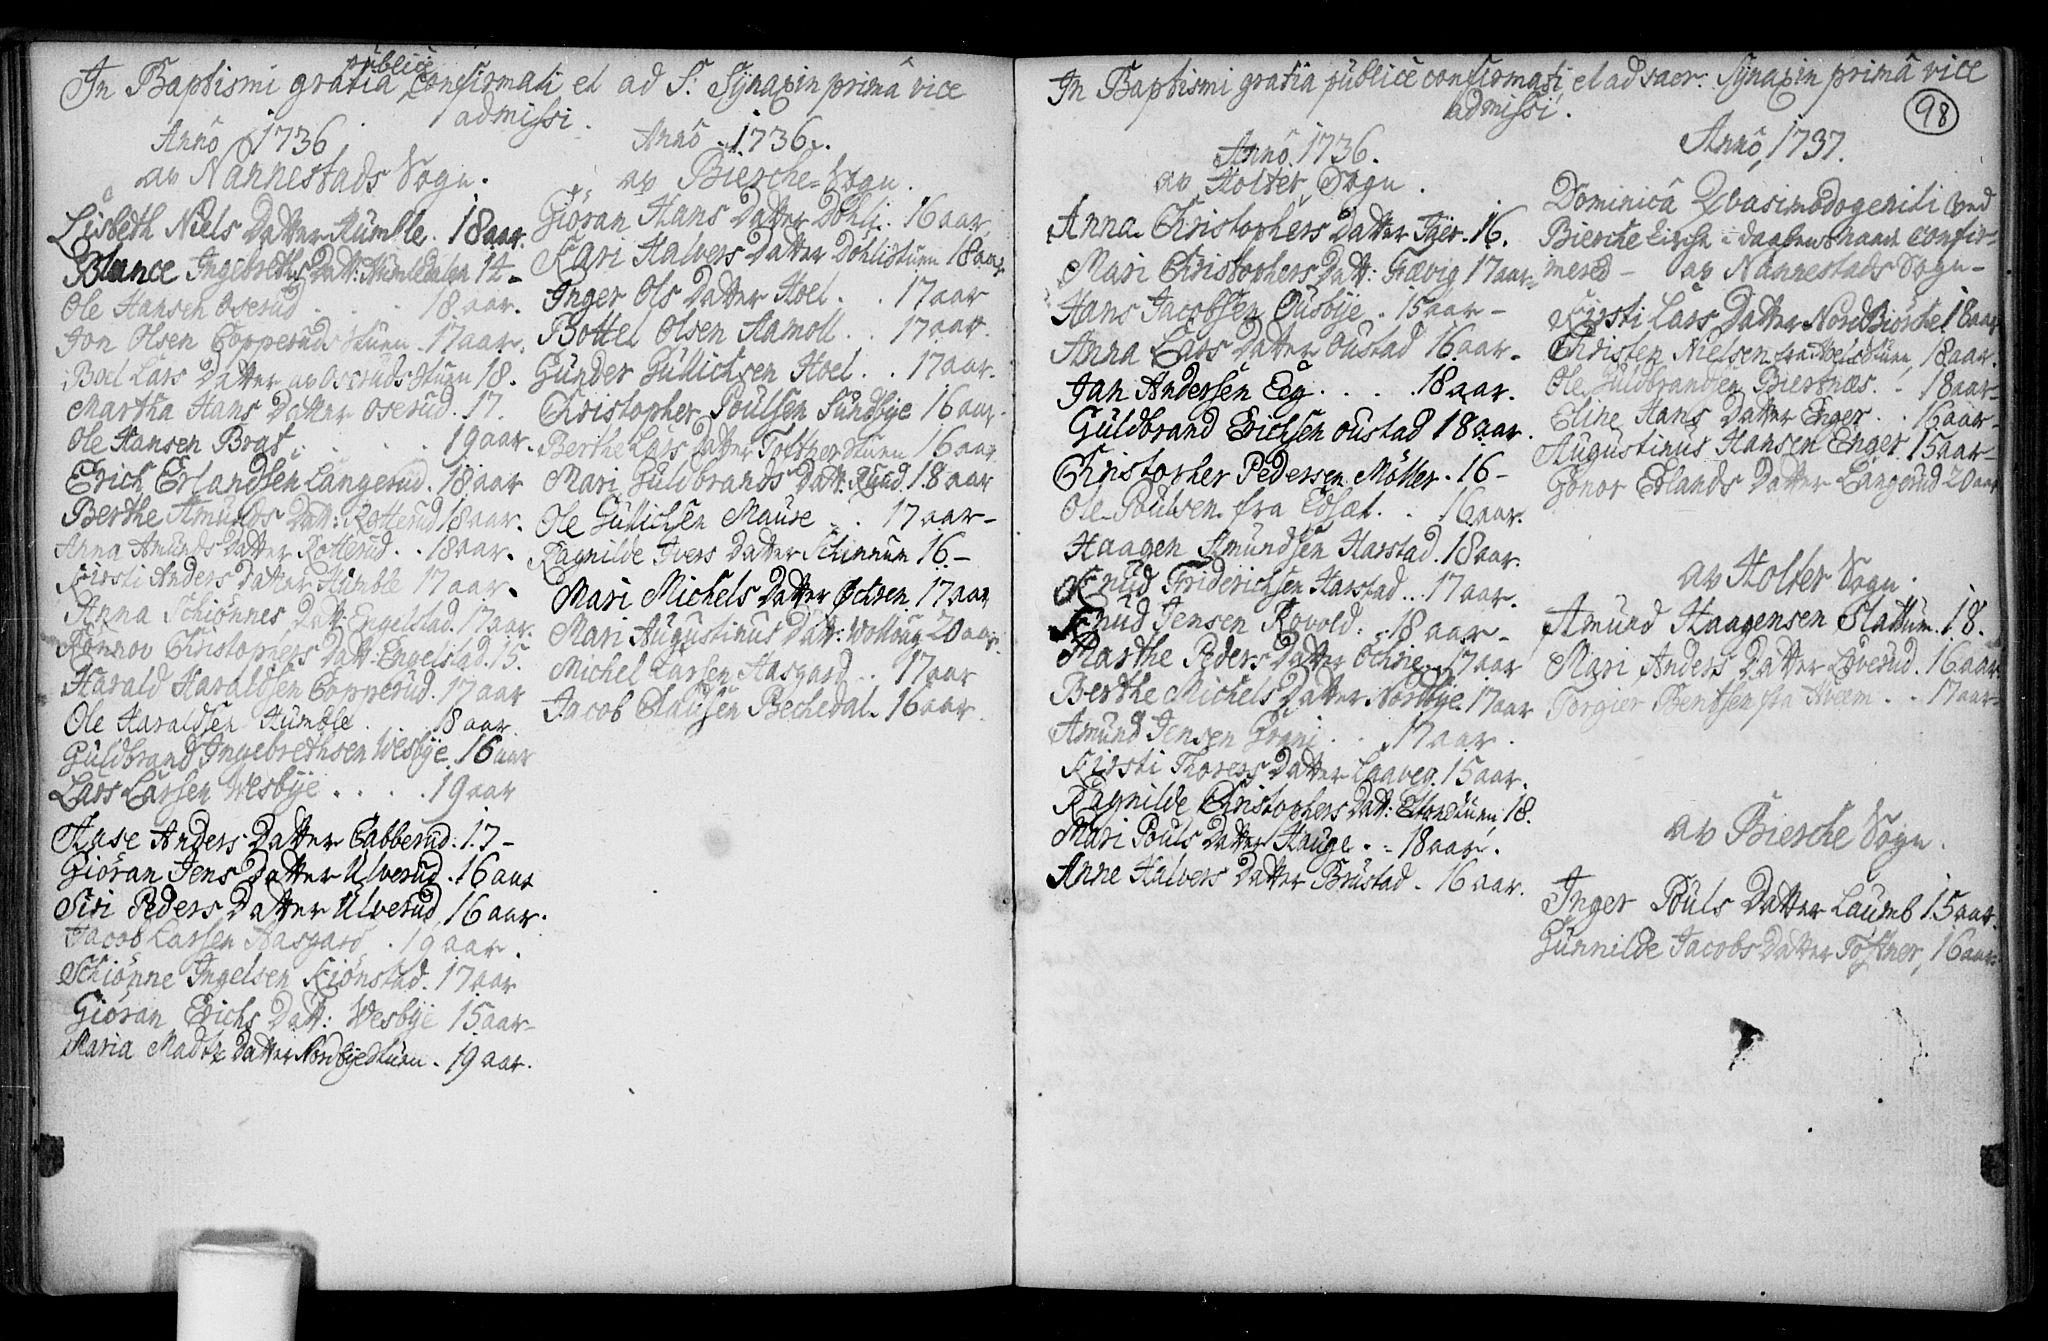 SAO, Nannestad prestekontor Kirkebøker, F/Fa/L0005: Ministerialbok nr. I 5, 1729-1738, s. 98